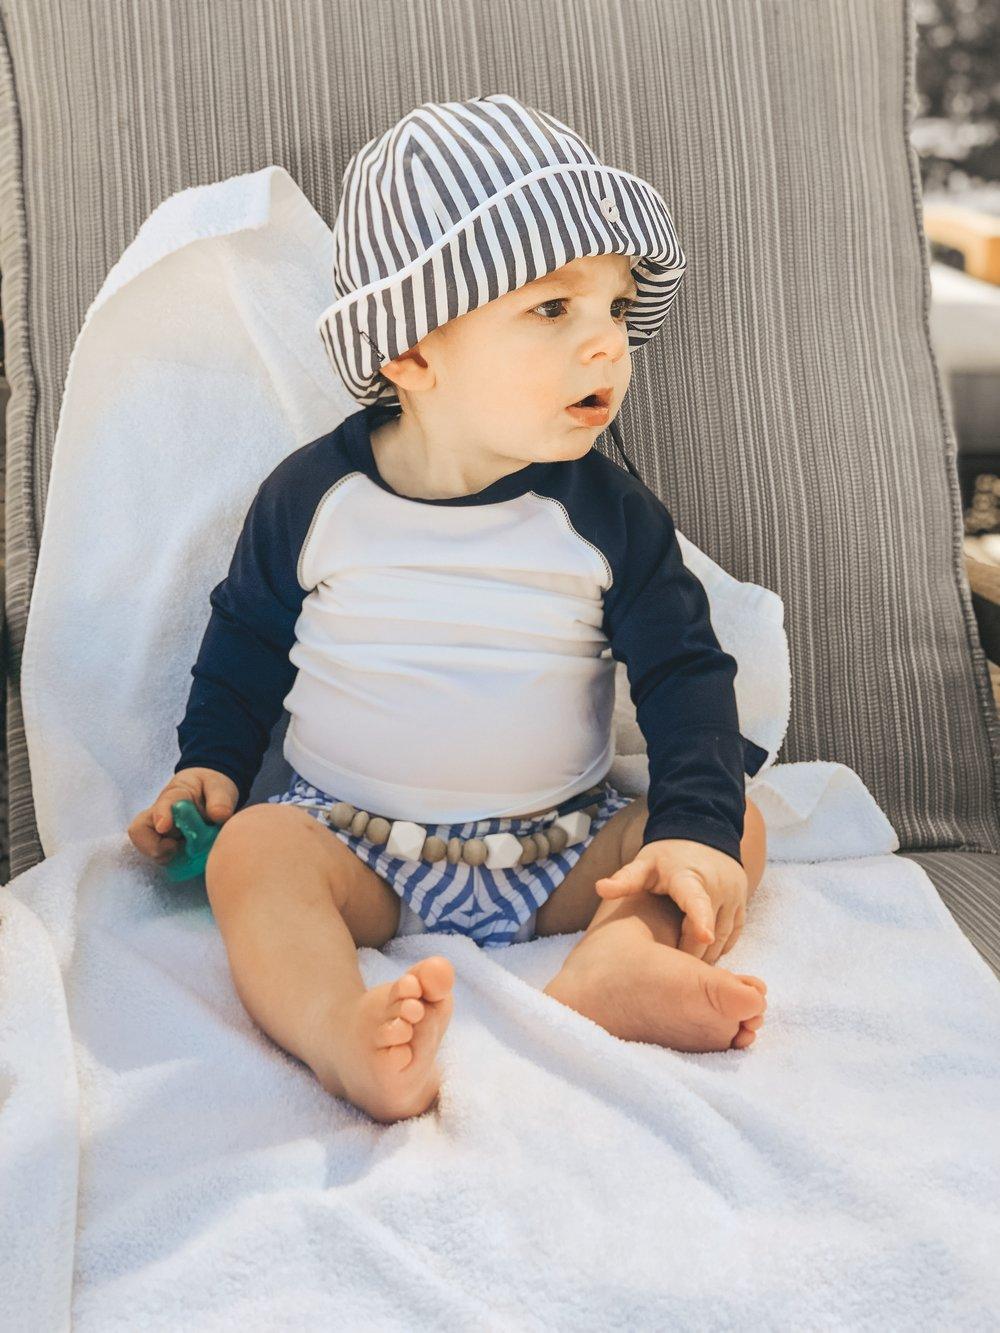 Jett Jones 11 Month Milestones.  UPF 50 Shirt for baby boy.  Baby boy summer style. The Beaufort Bonnet Company Hat.